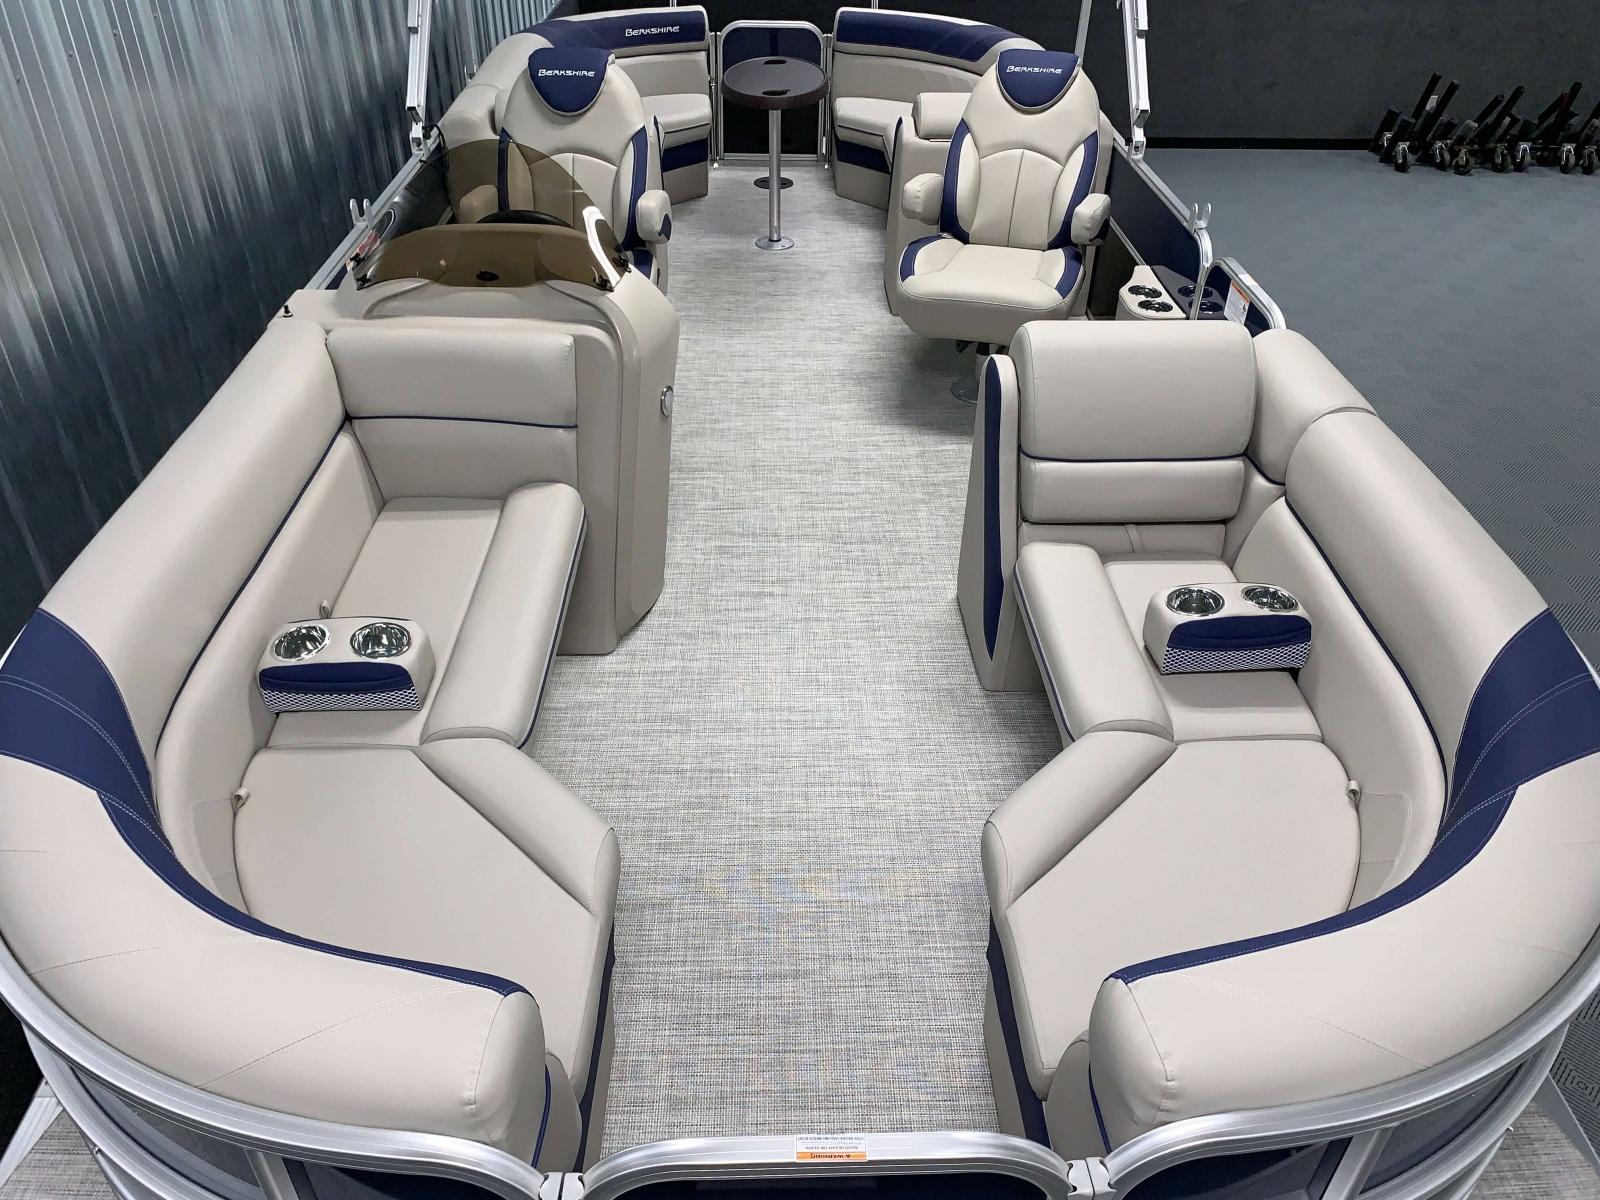 Woven Vinyl Flooring on the 2021 Berkshire 24RFX LE Pontoon Boat